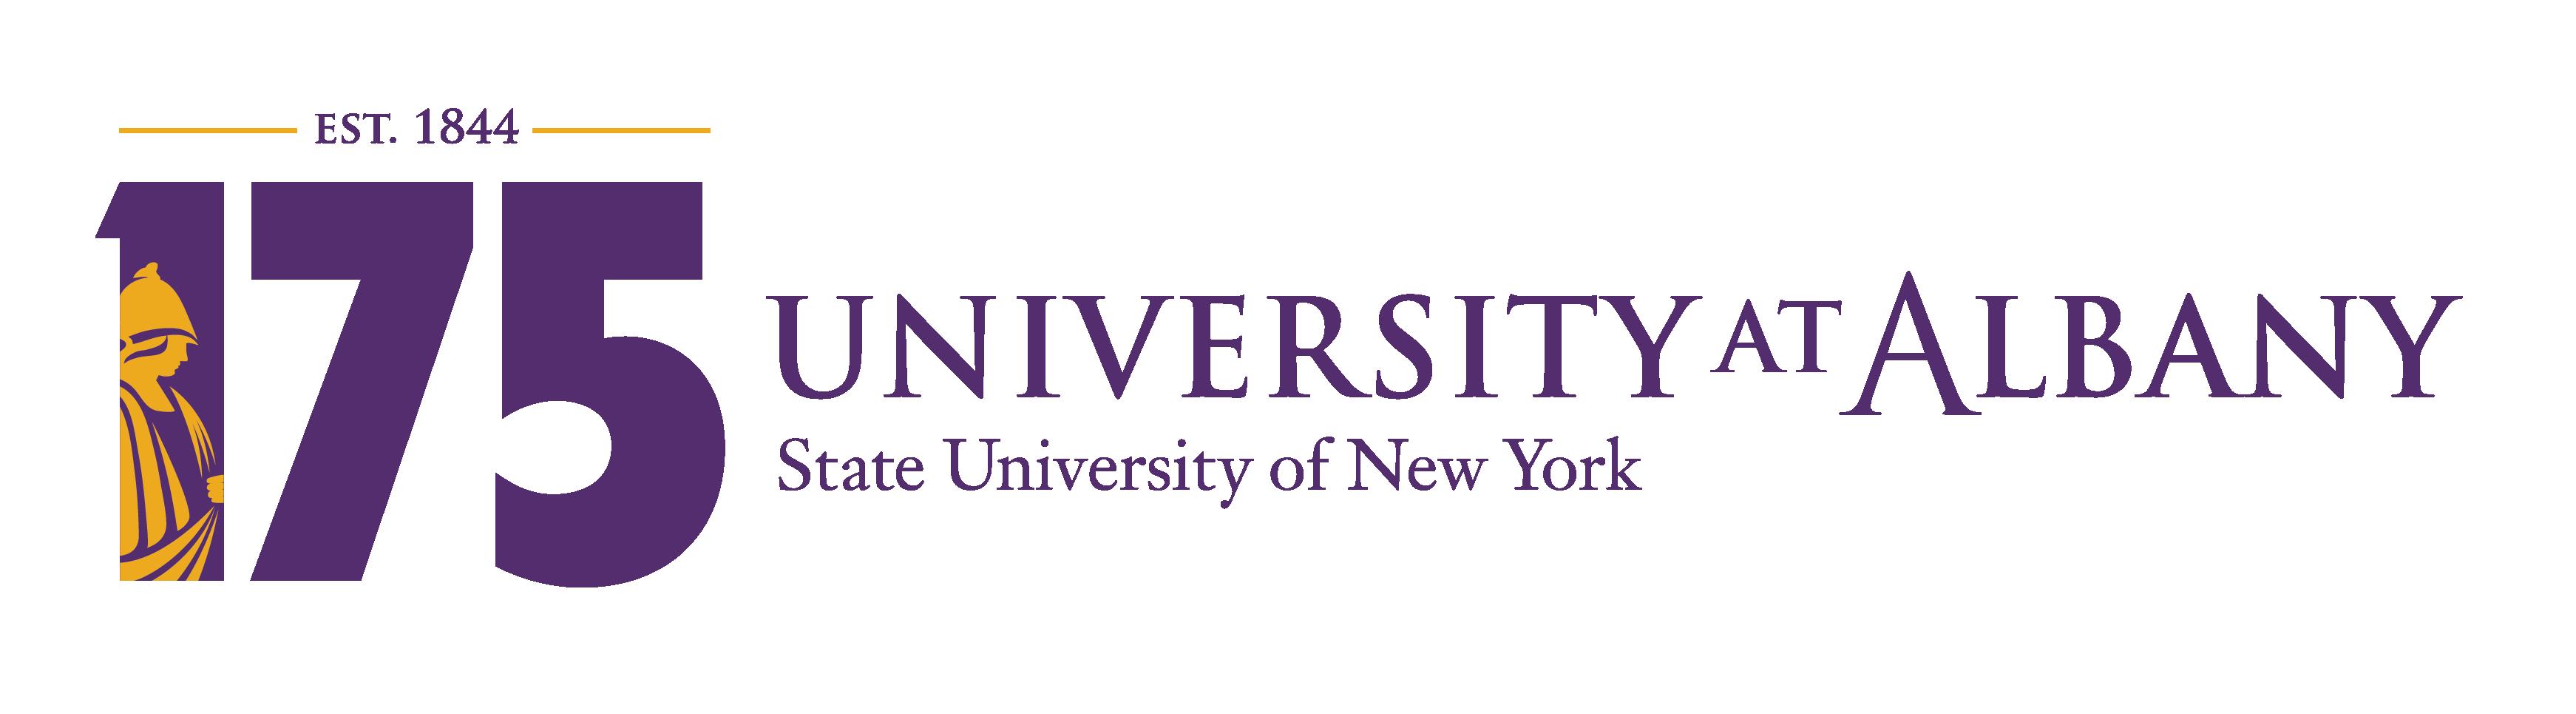 UAlbany 175th Anniversary Logo